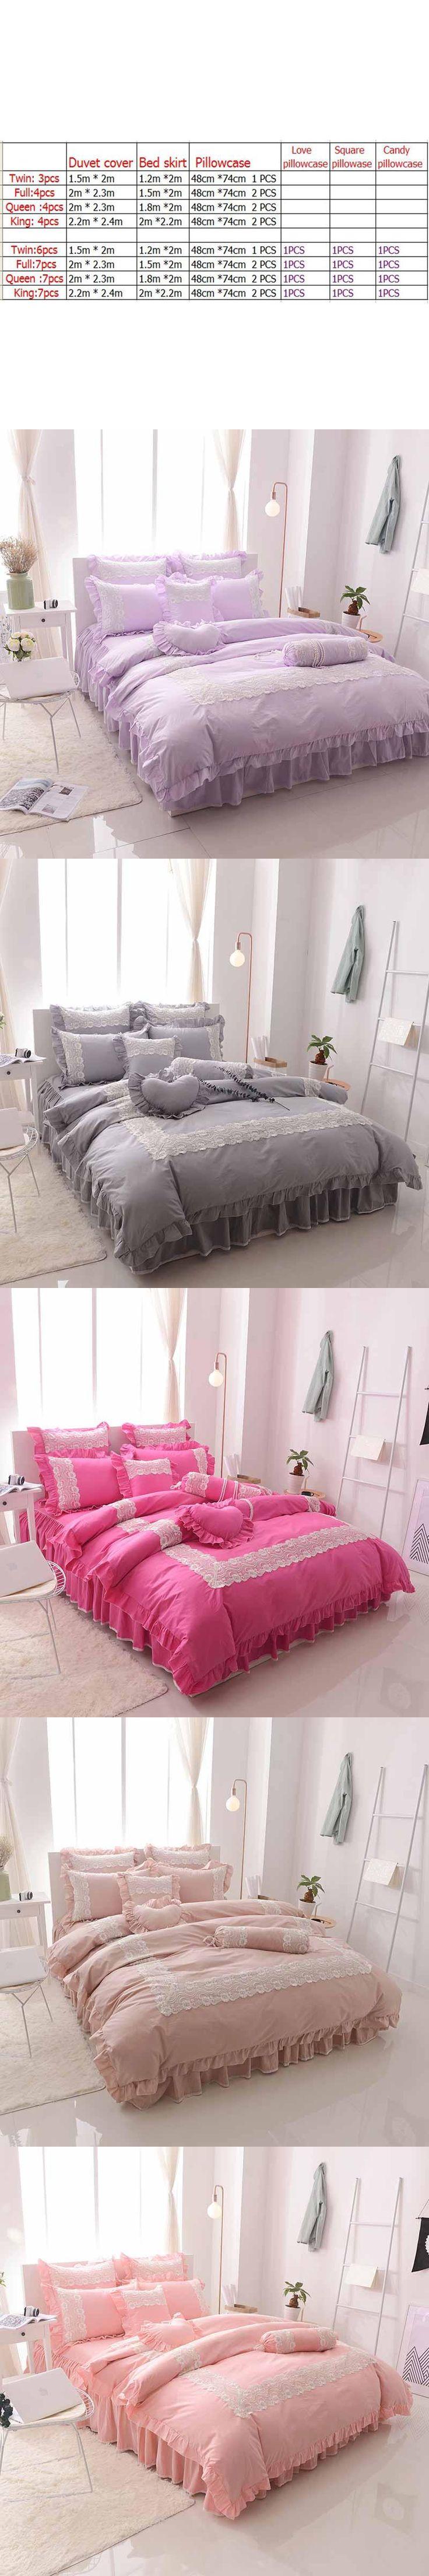 Lace princess 100%cotton bedding set comforter/duvet cover queen king 4/7pcs wedding white bed skirts  bedclothes